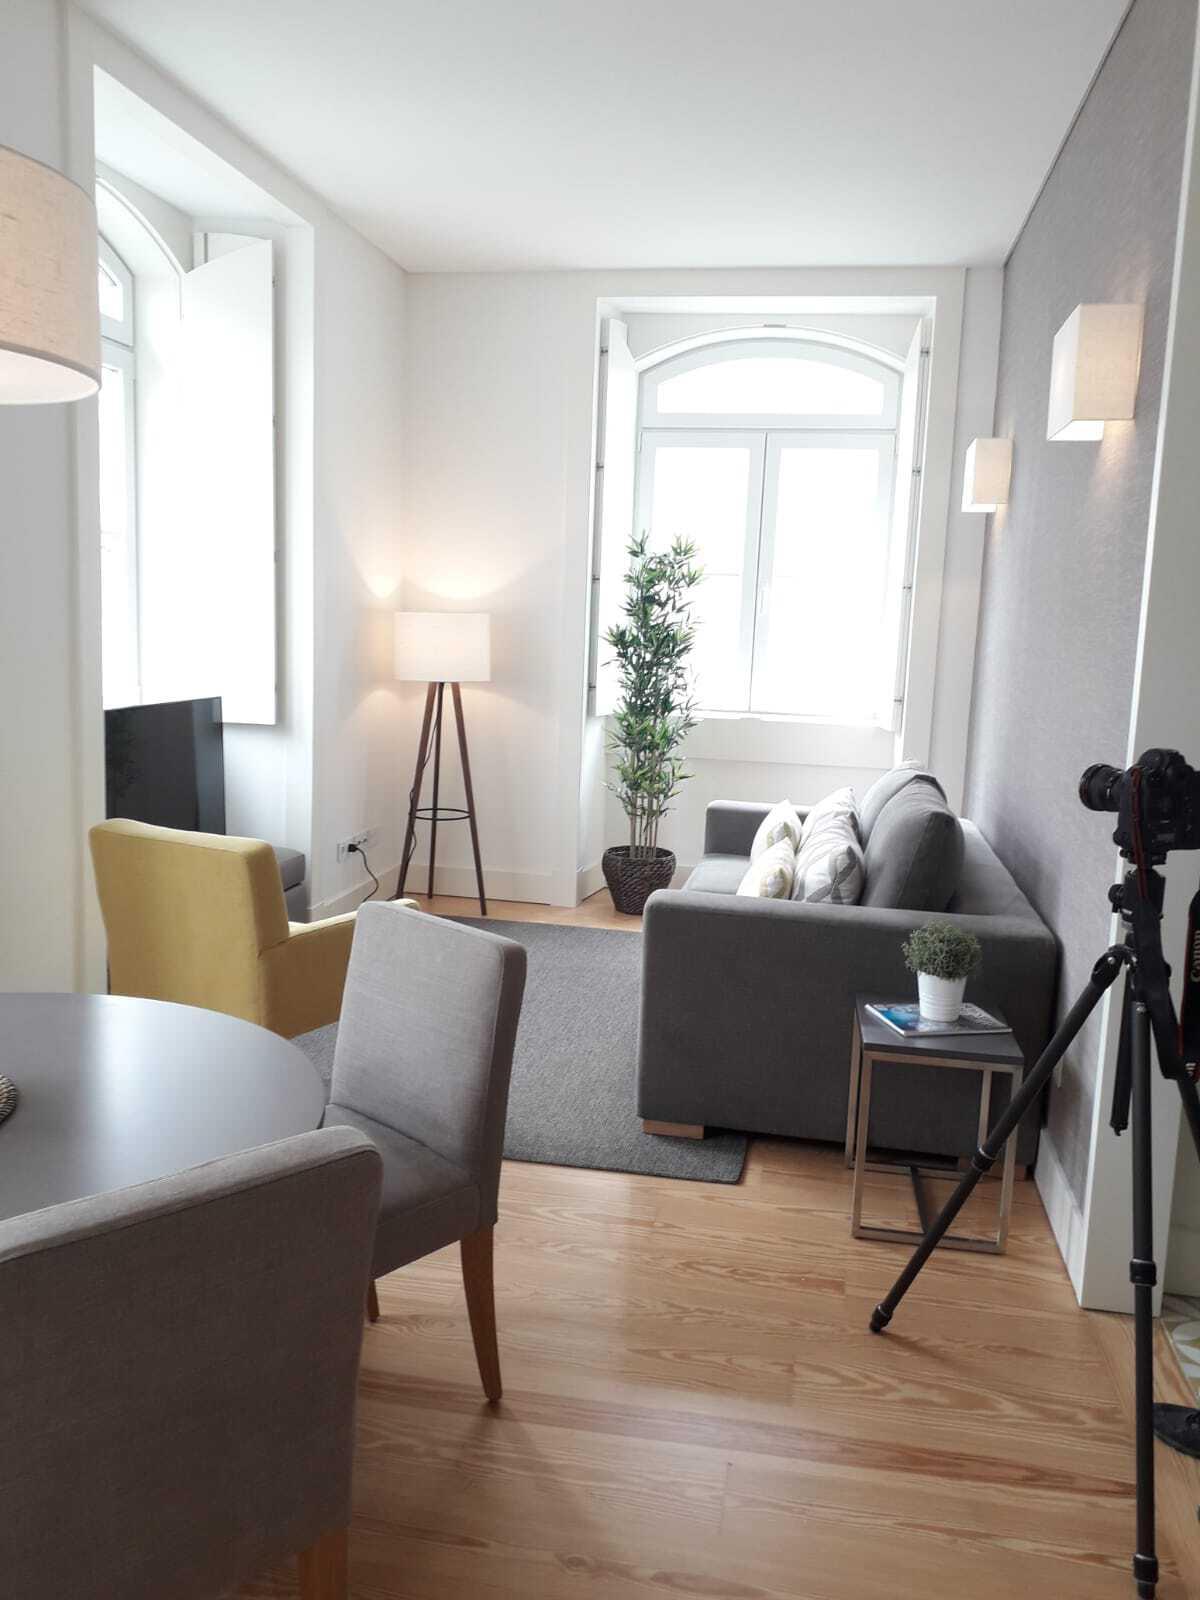 pf17866-apartamento-t1-lisboa-eb61faa3-44ce-437a-8884-bd0df44a97c7